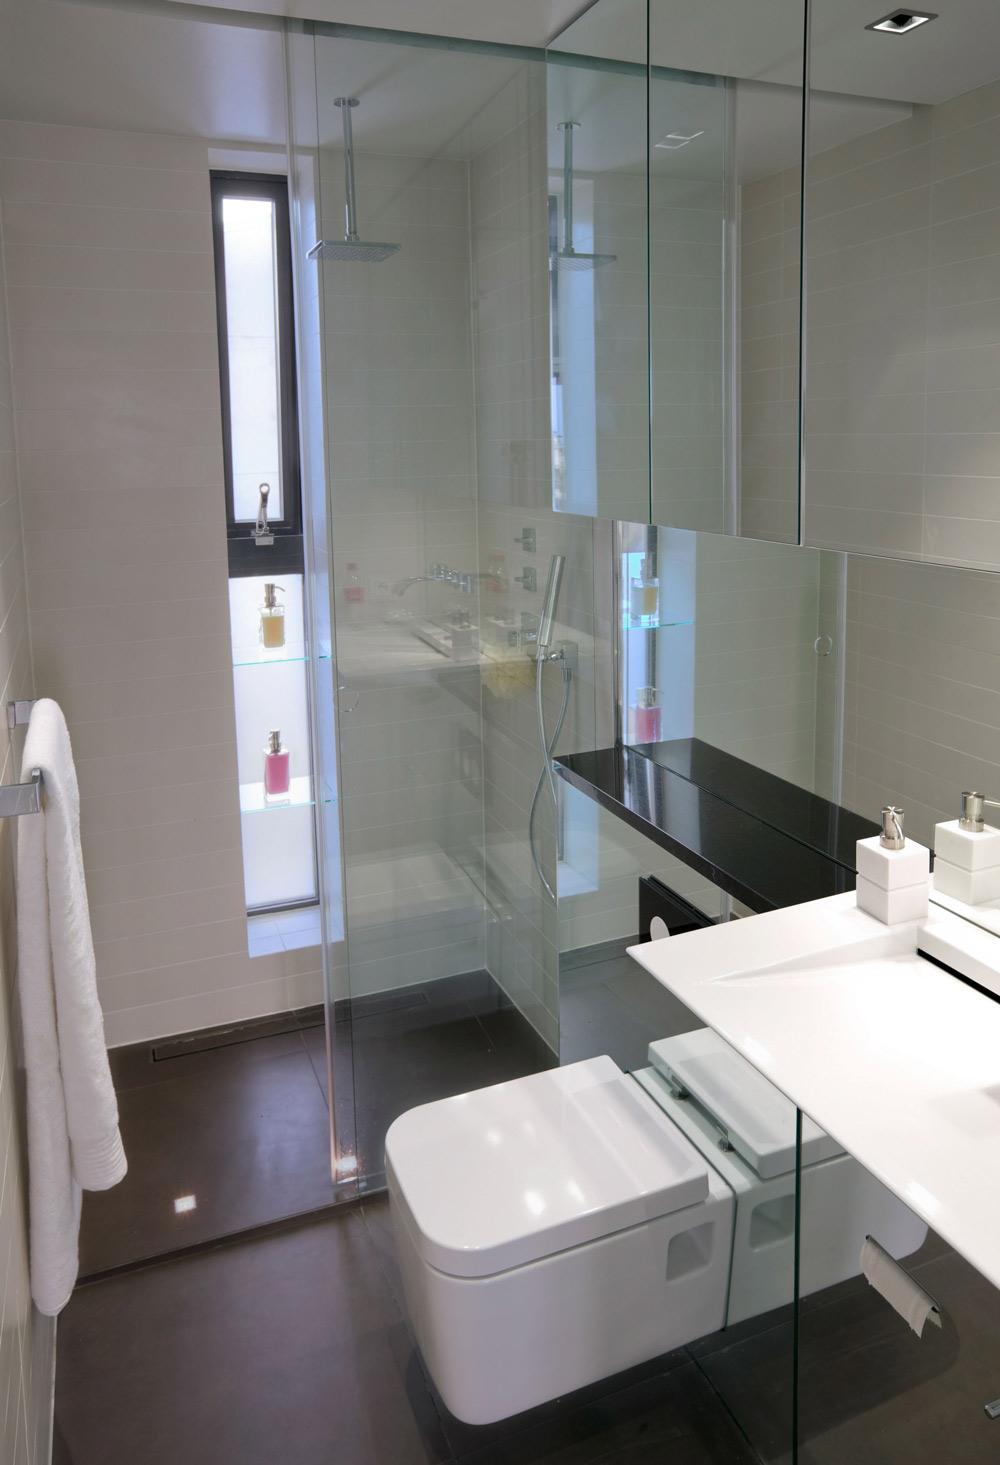 Bathroom, Glass Shower, Modern Apartment in Reykjavik, Iceland